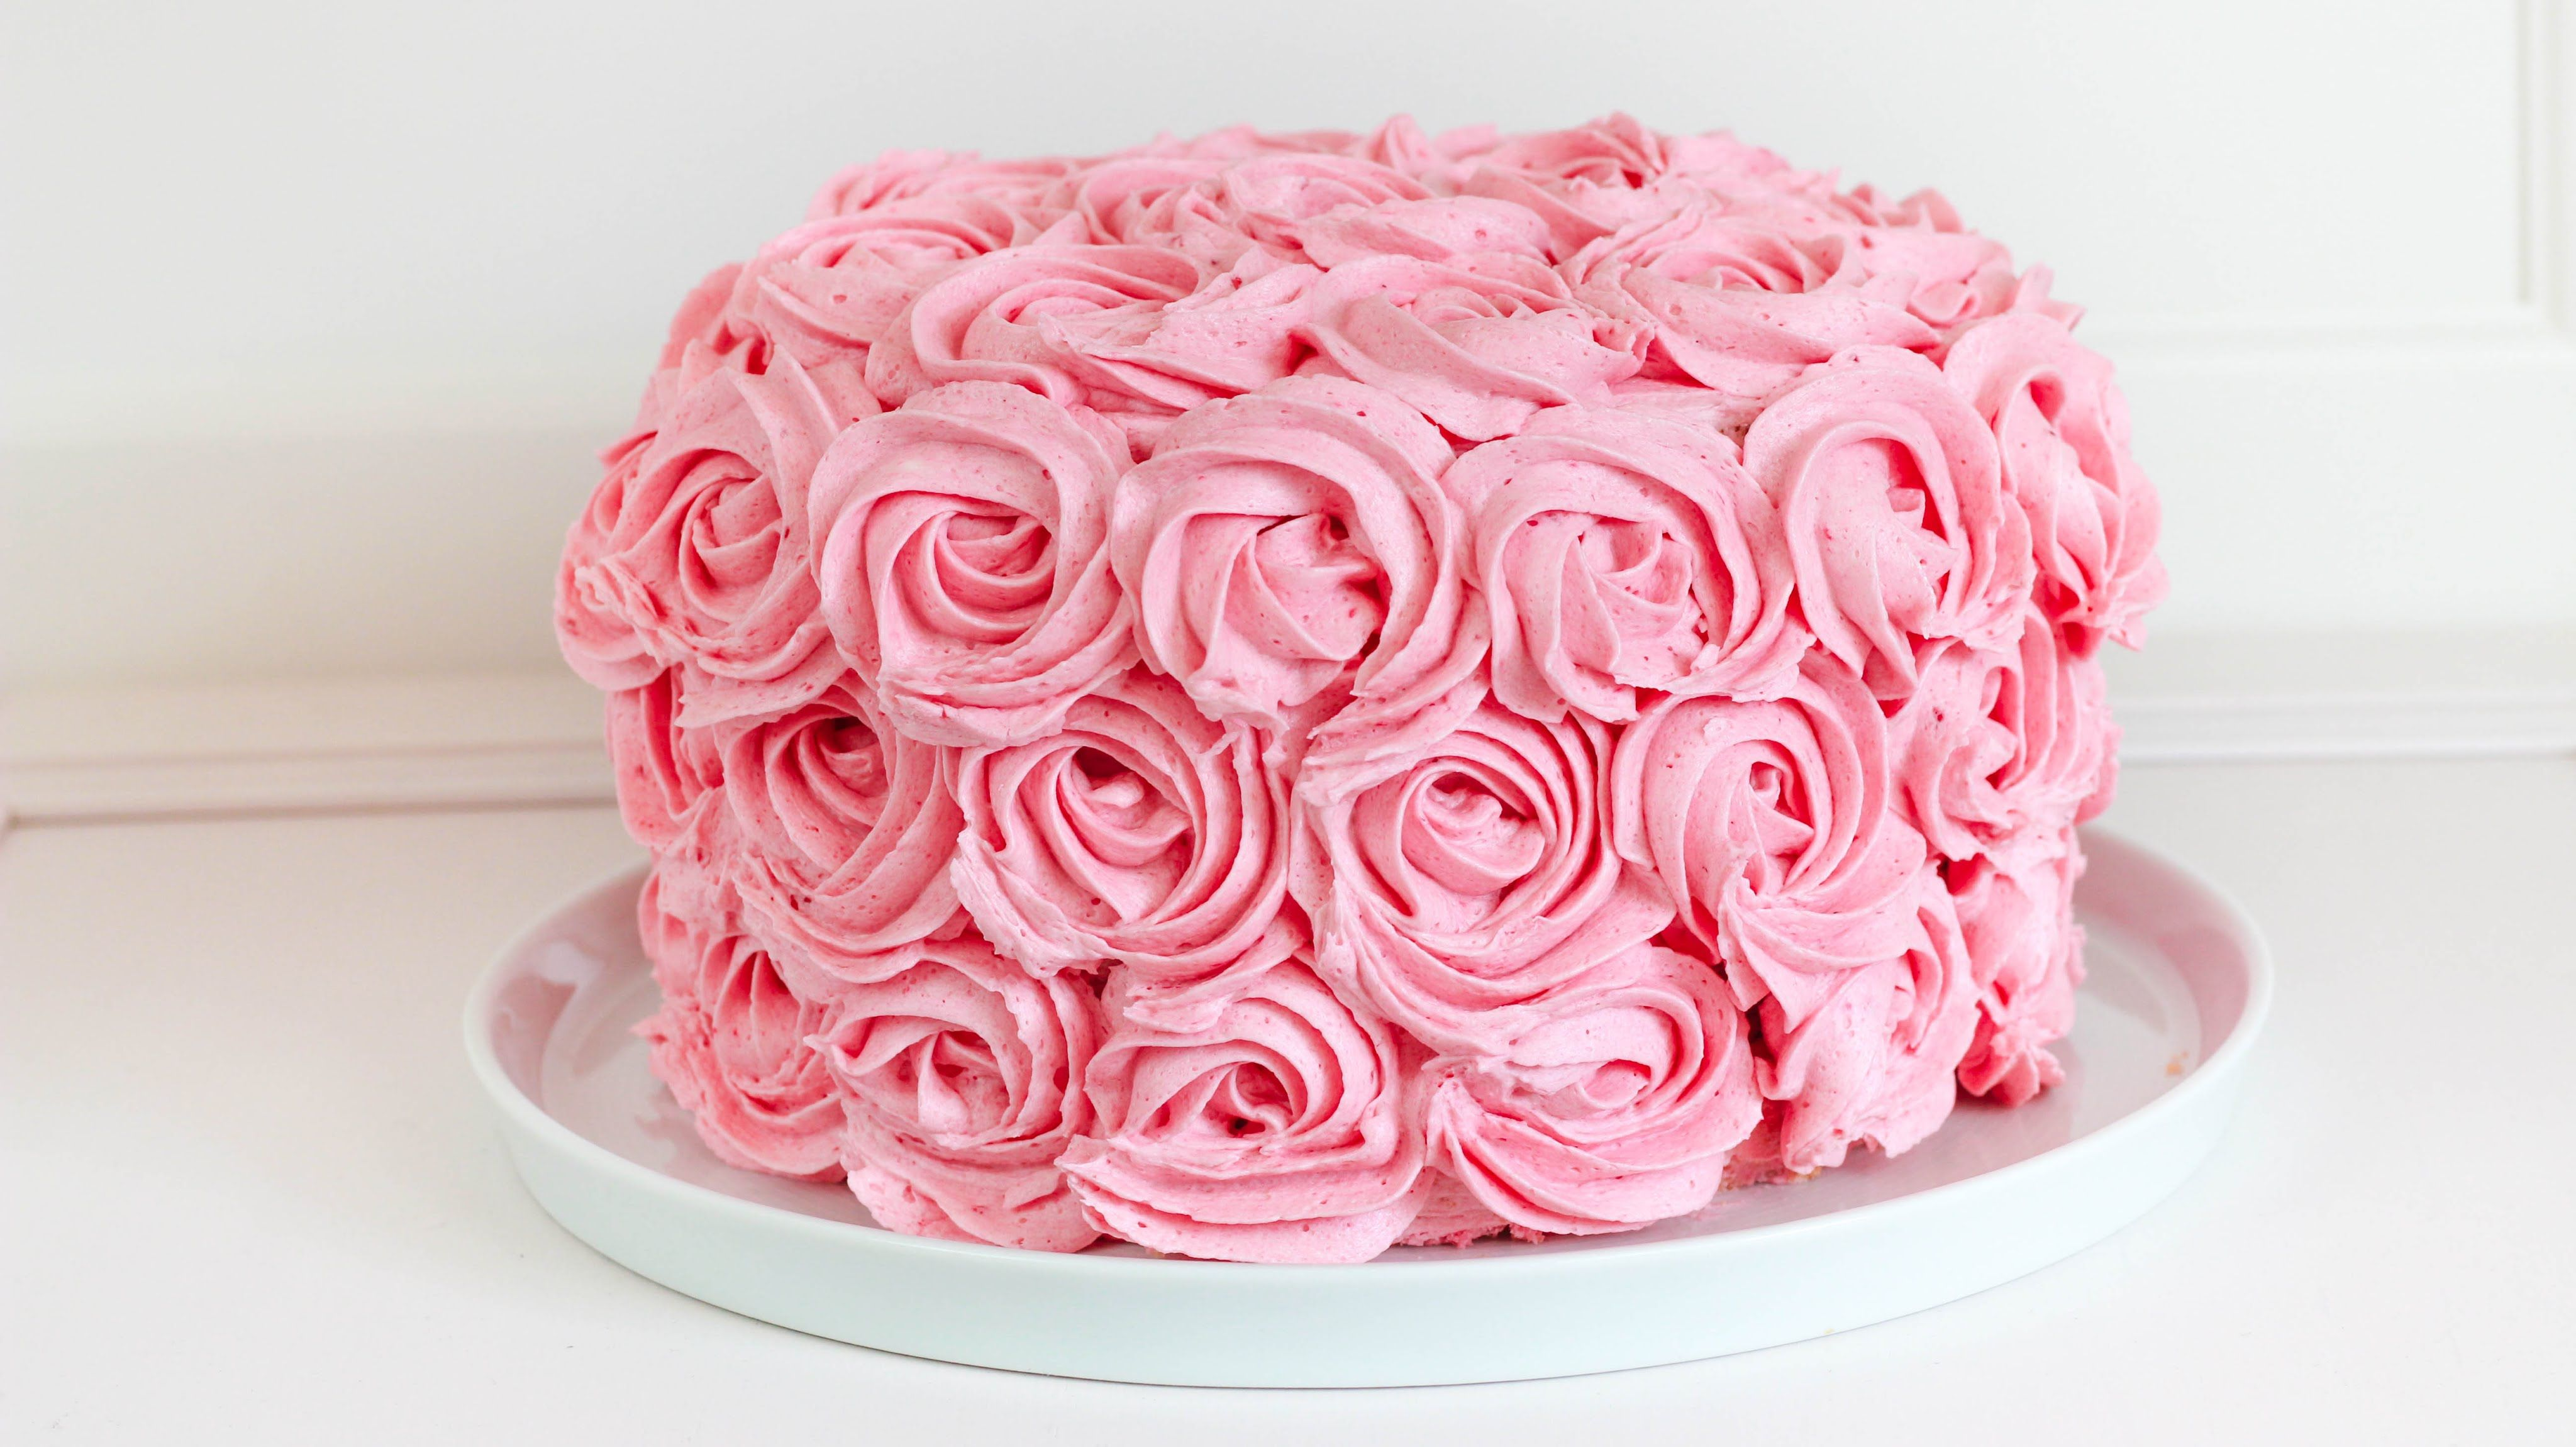 Rosentorte mit Erdbeeren und Himbeeren  Buttercreme Rosen